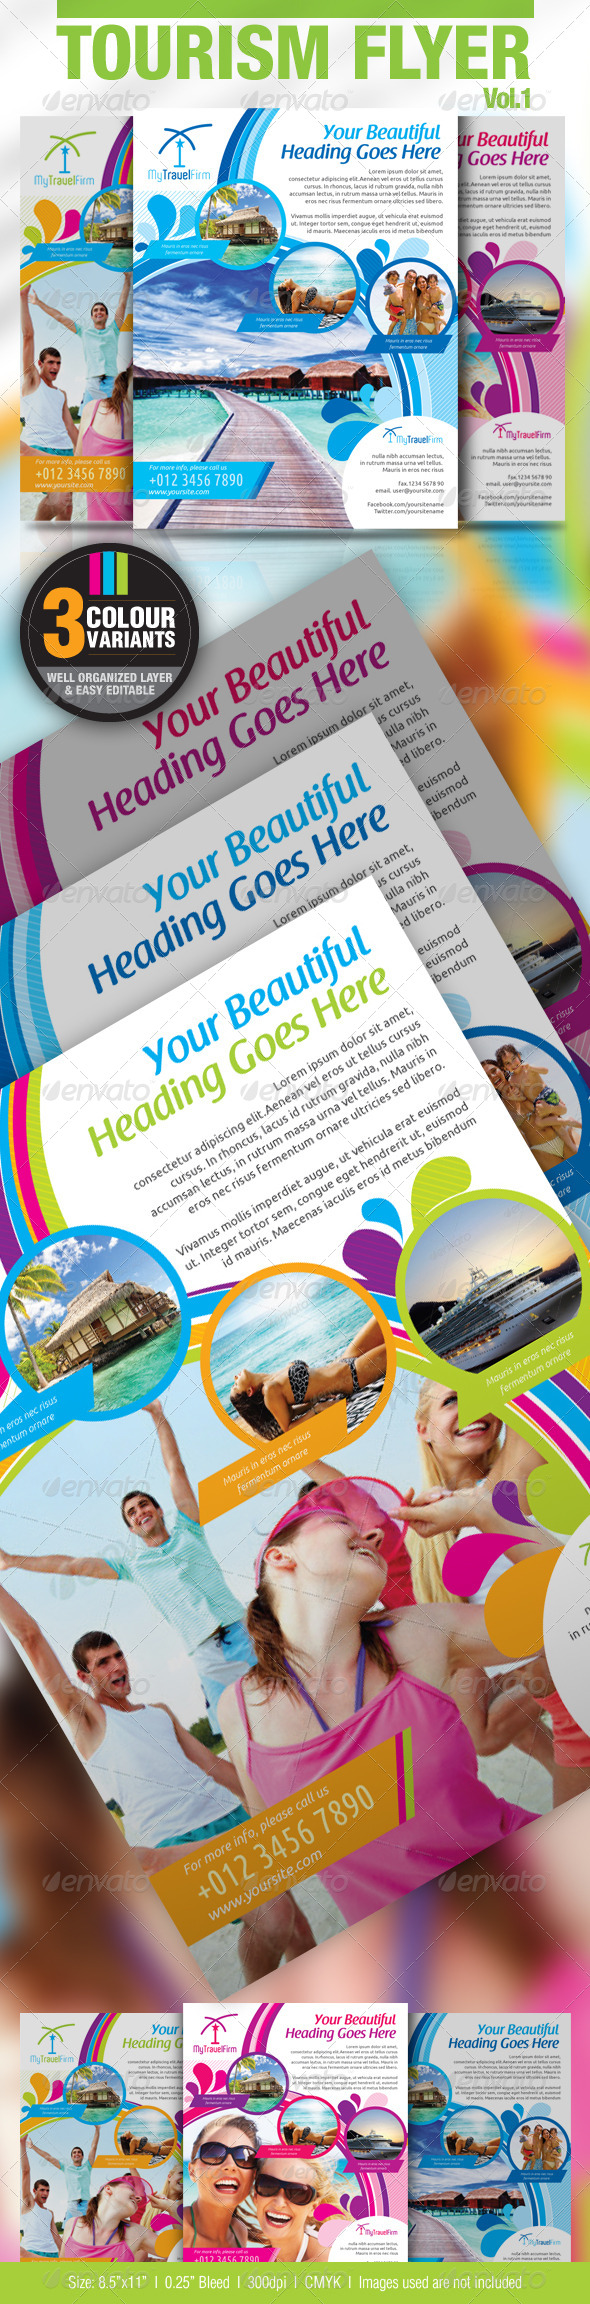 Tourism Flyer Vol.1 - Holidays Events